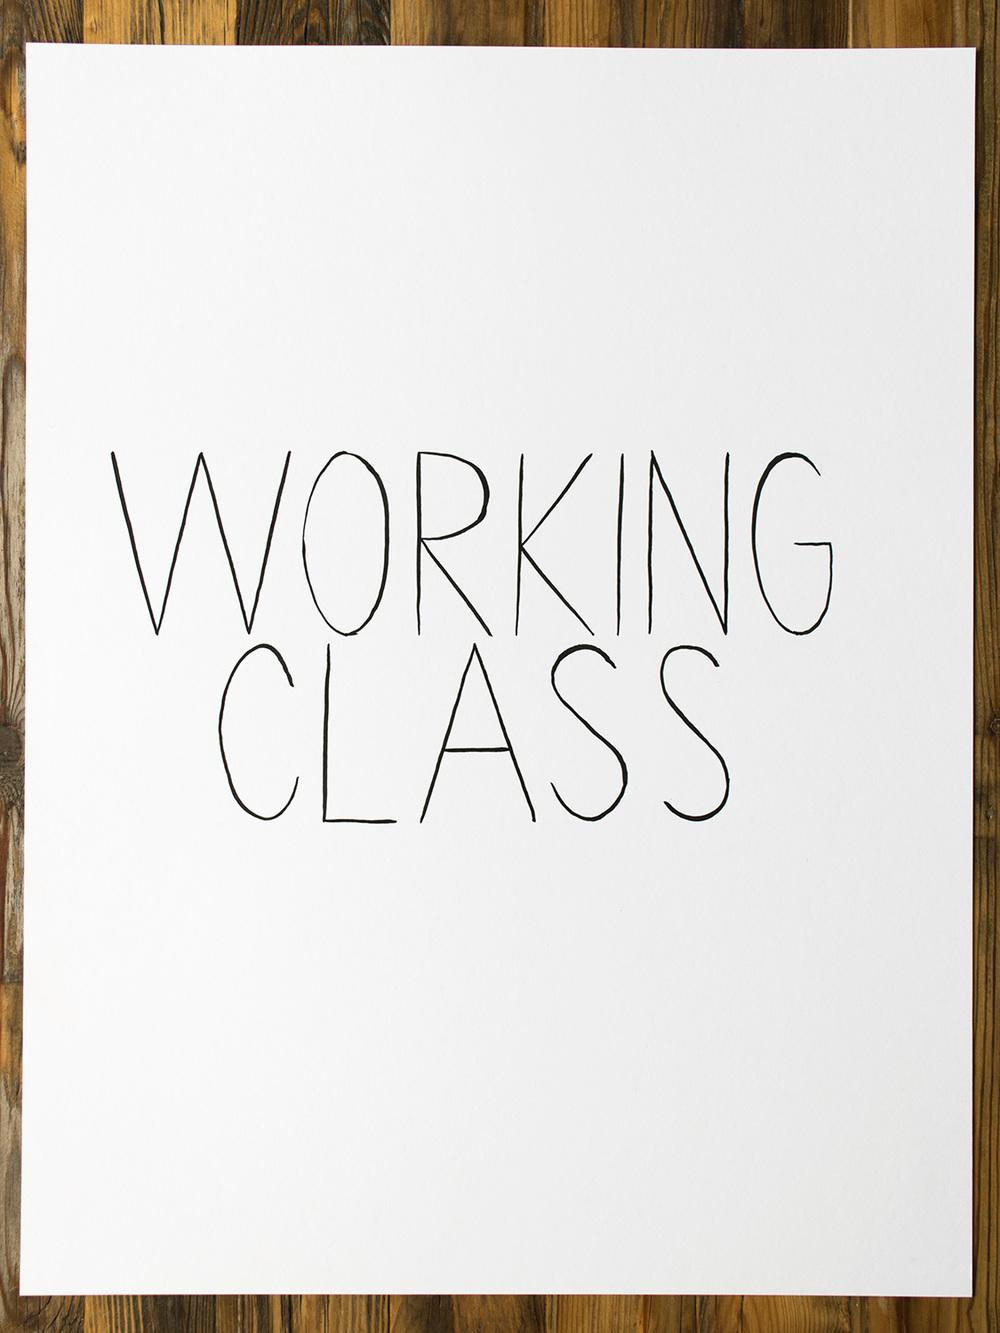 working_class-1500x1125.jpg